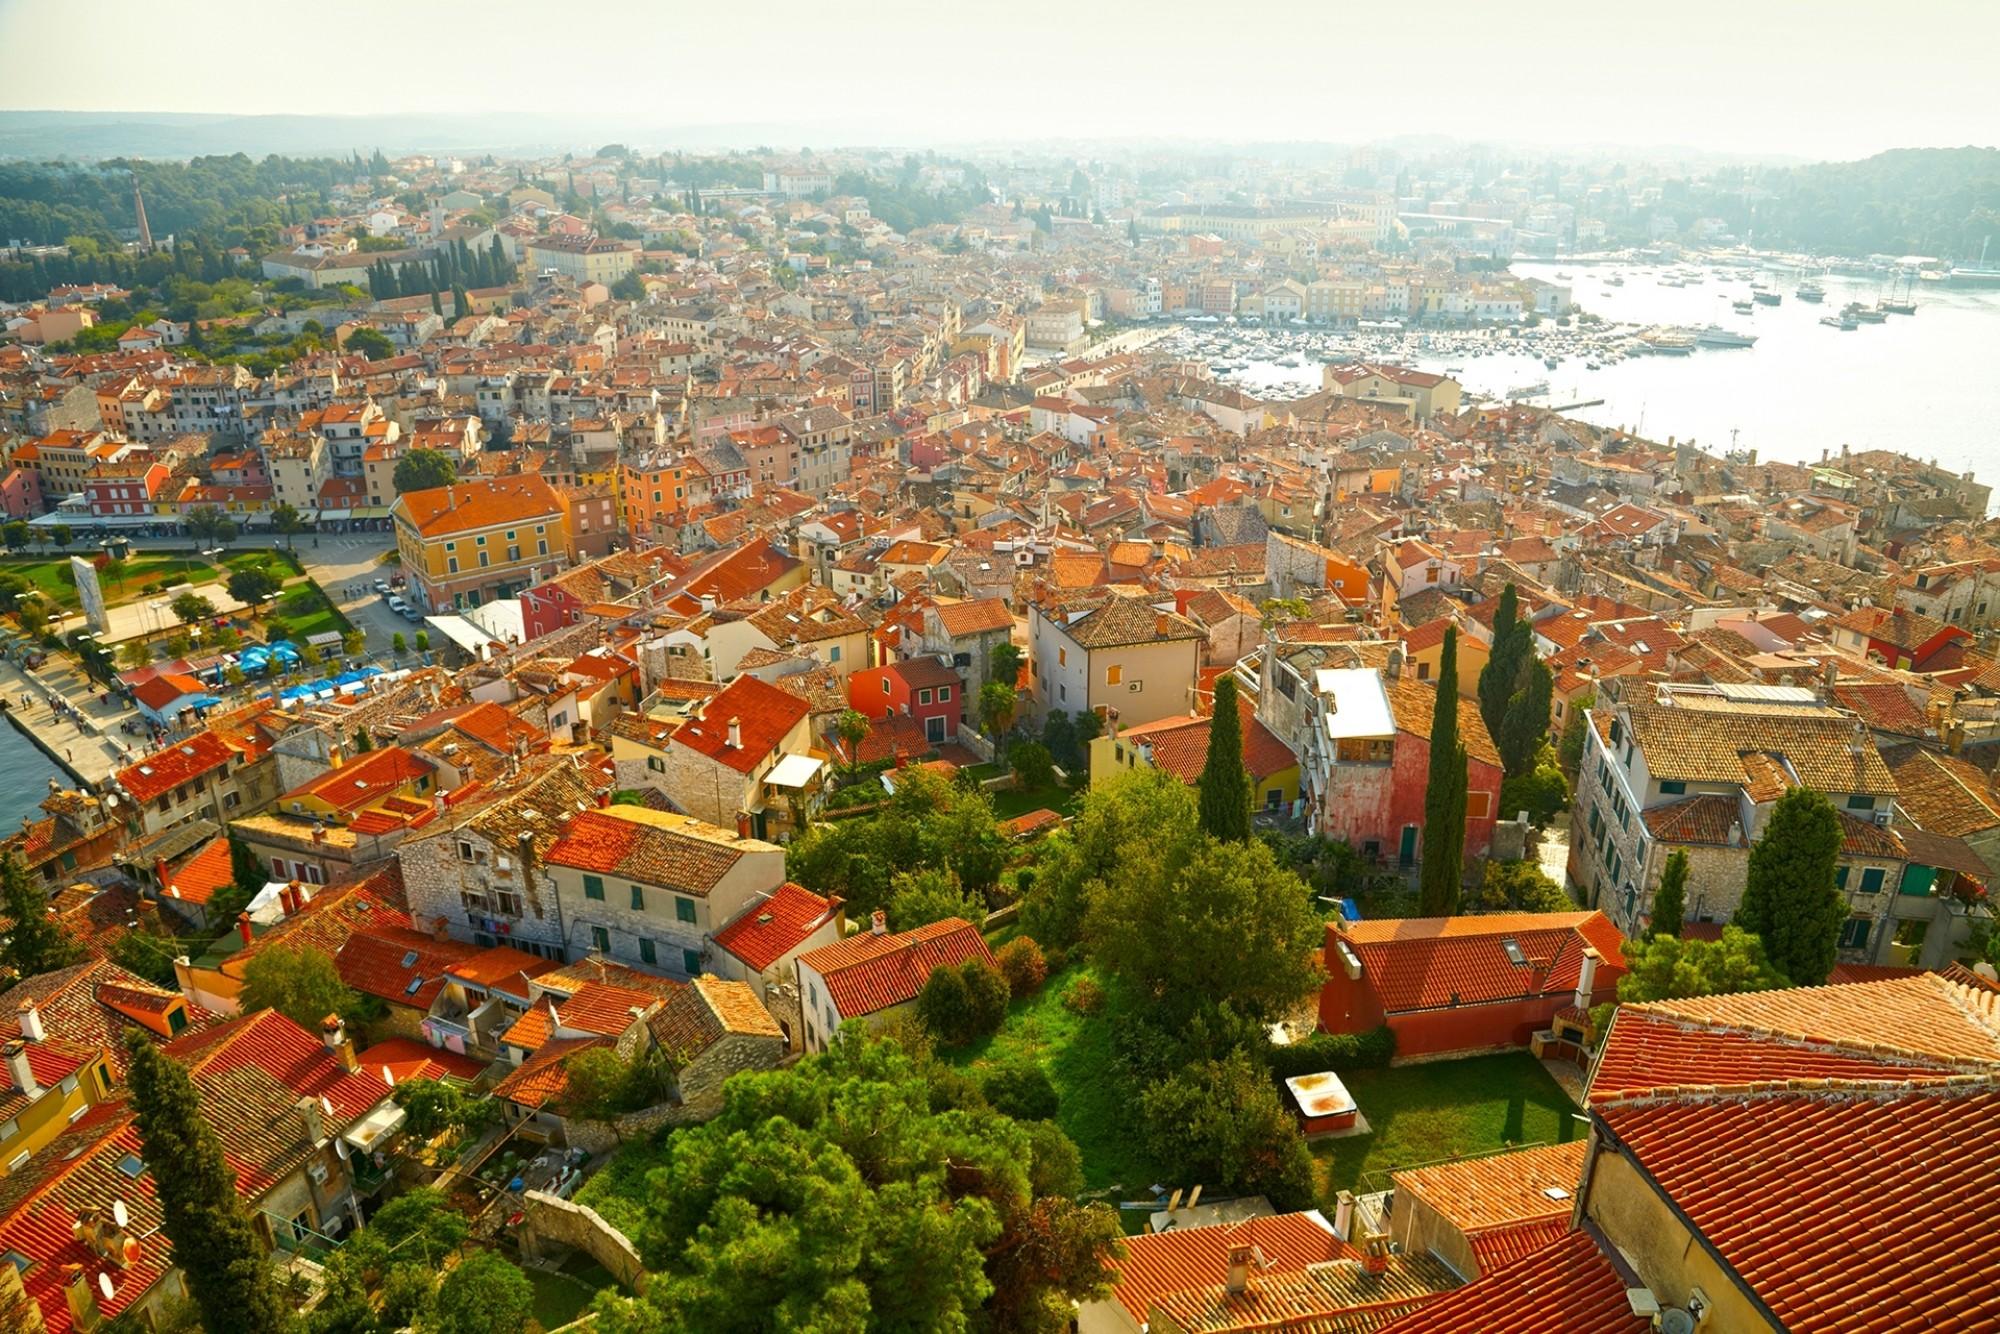 Roofs-of-old-town.-Rovinj-Croatia